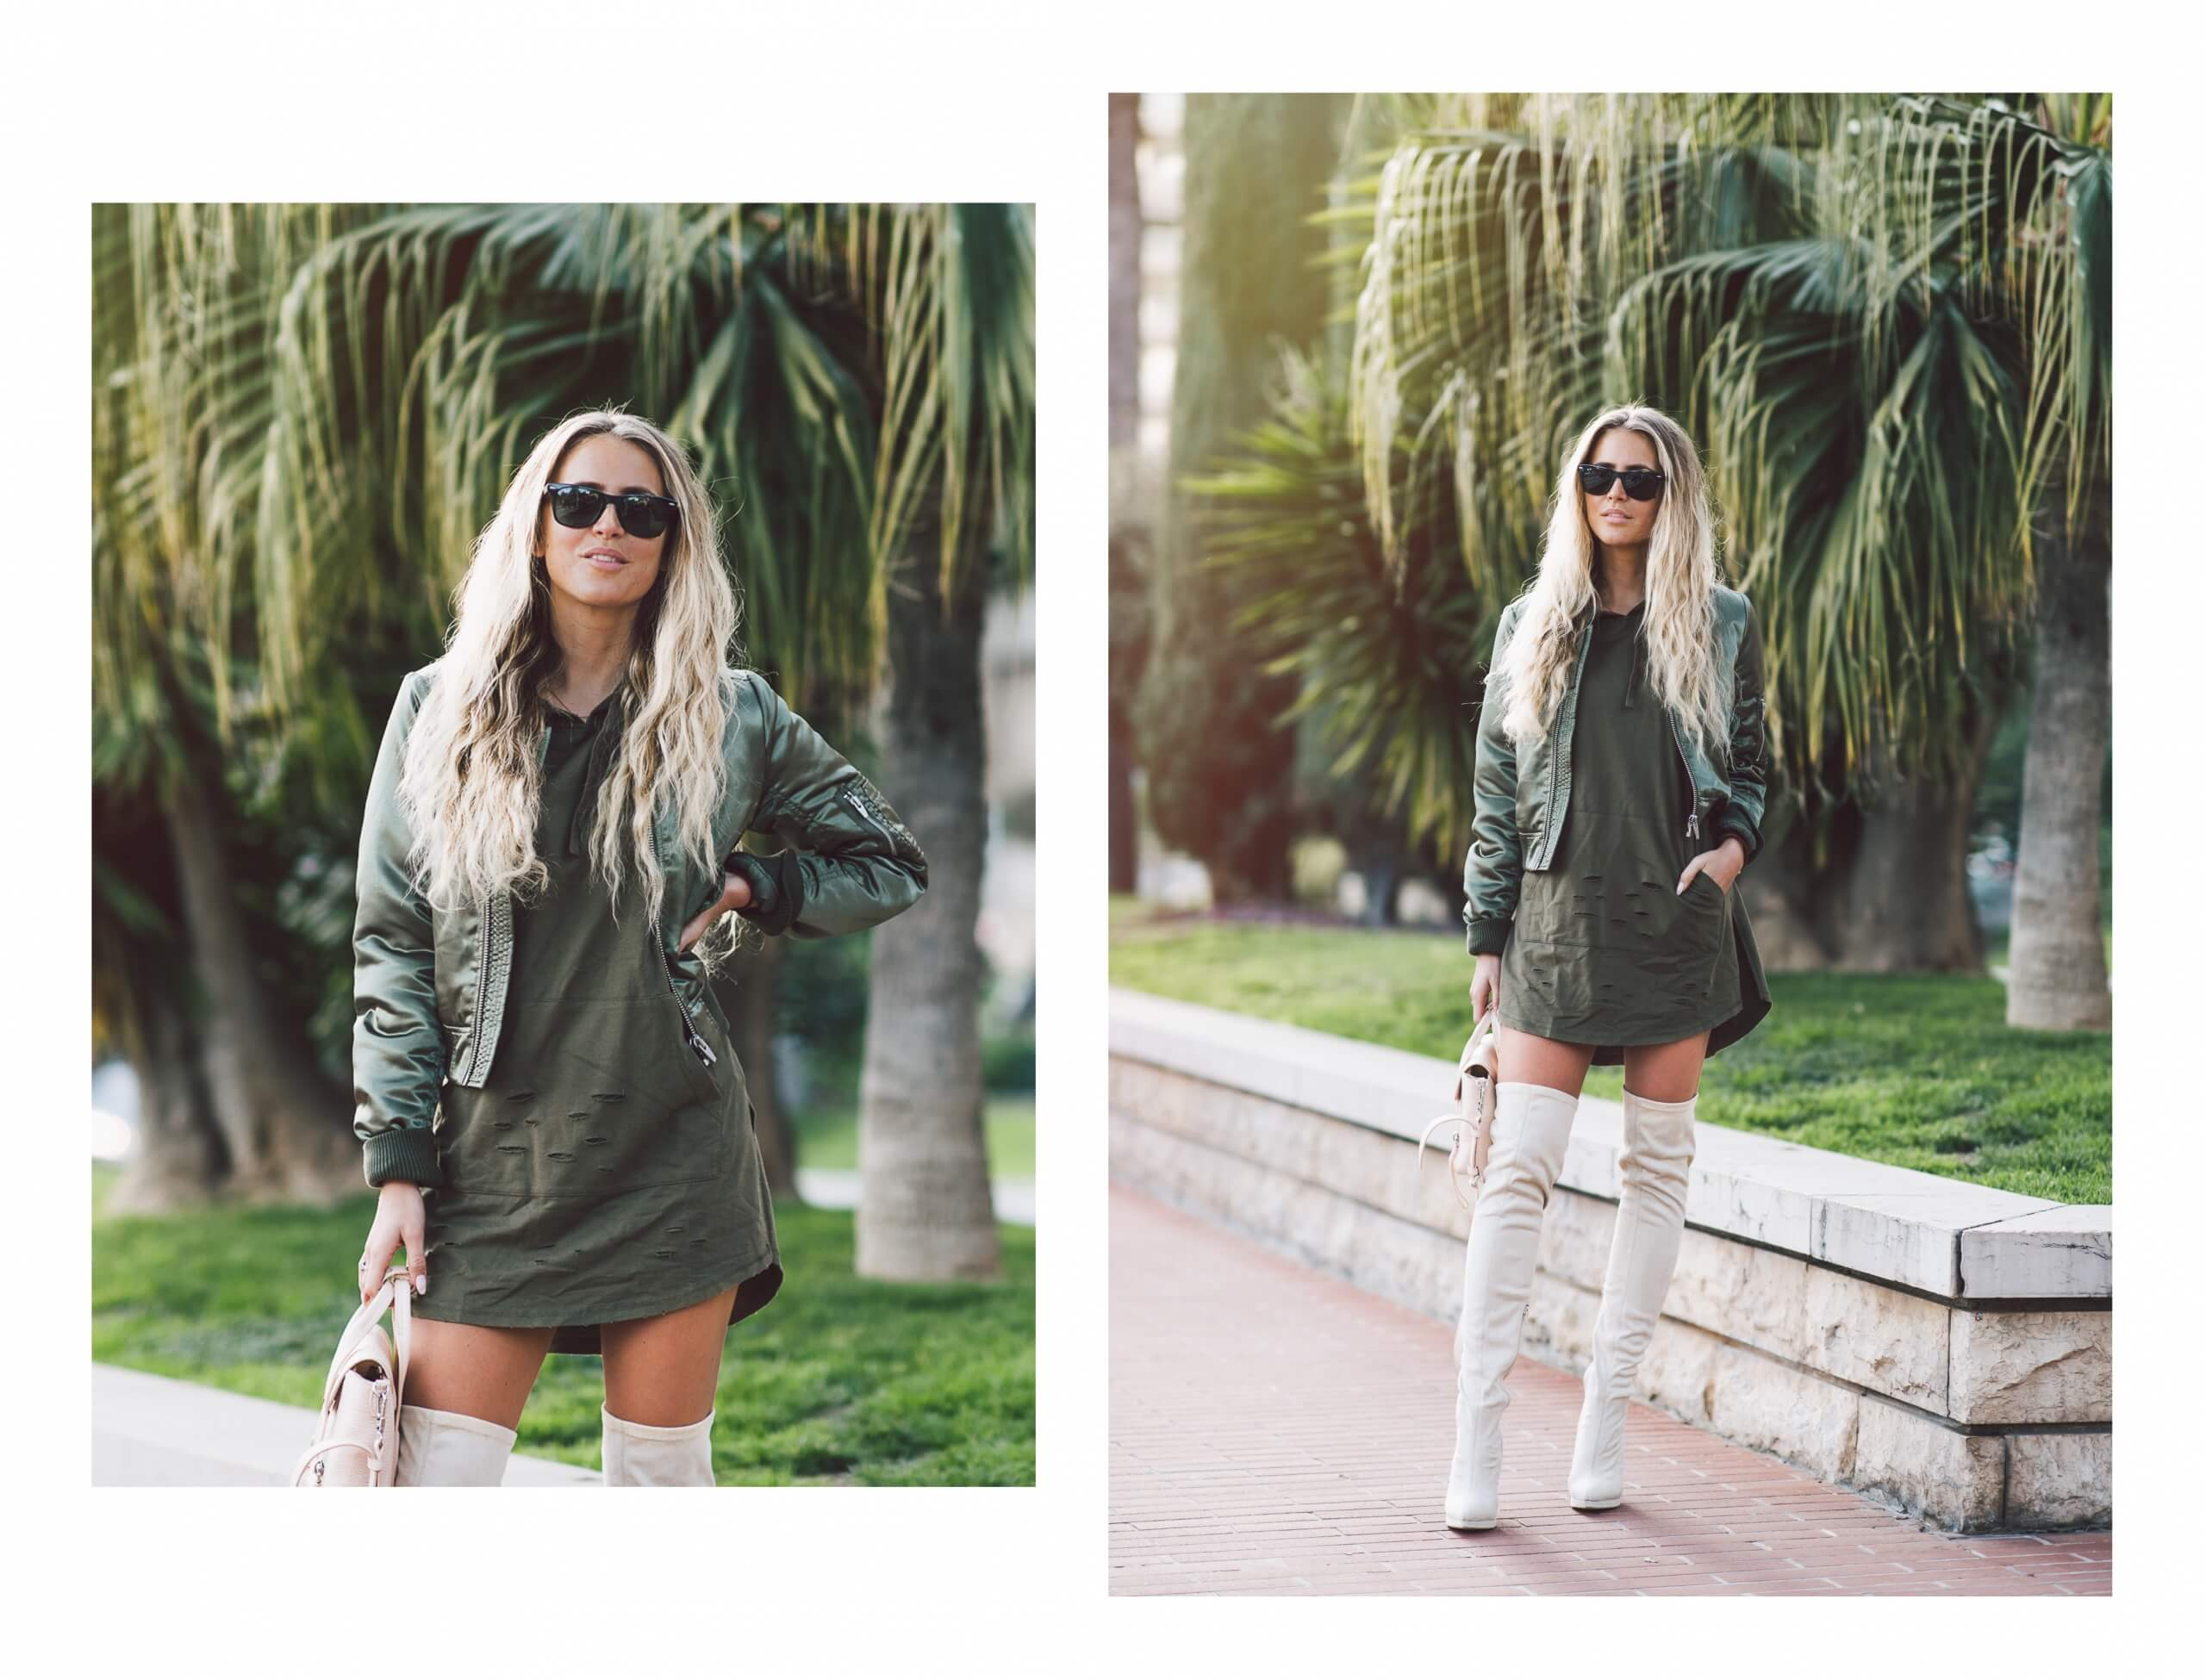 janni-deler-green-outfitDSC_9114-Redigera copy